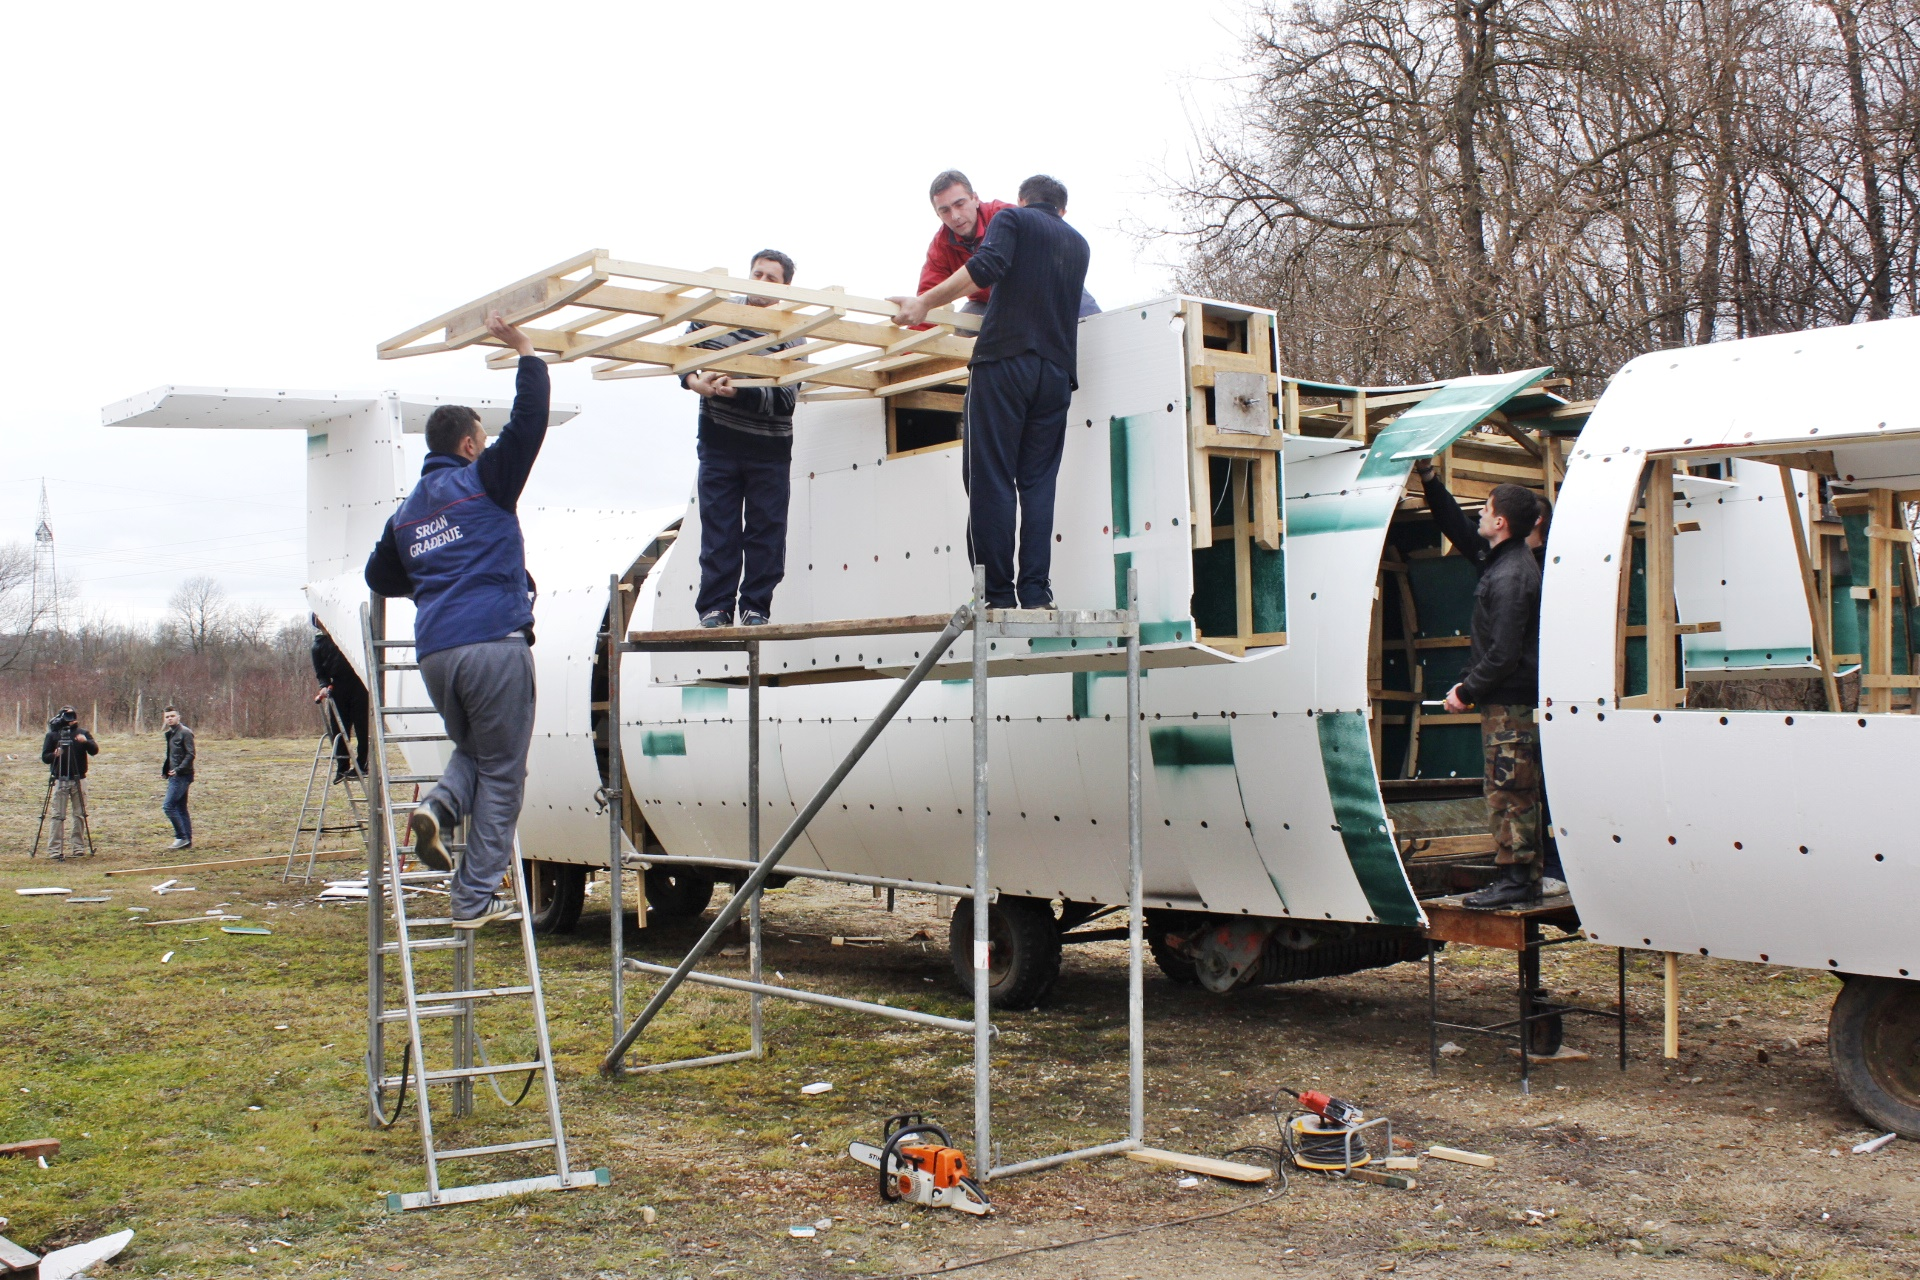 fašnik ribnica zrakoplov radnici 2016 (14)